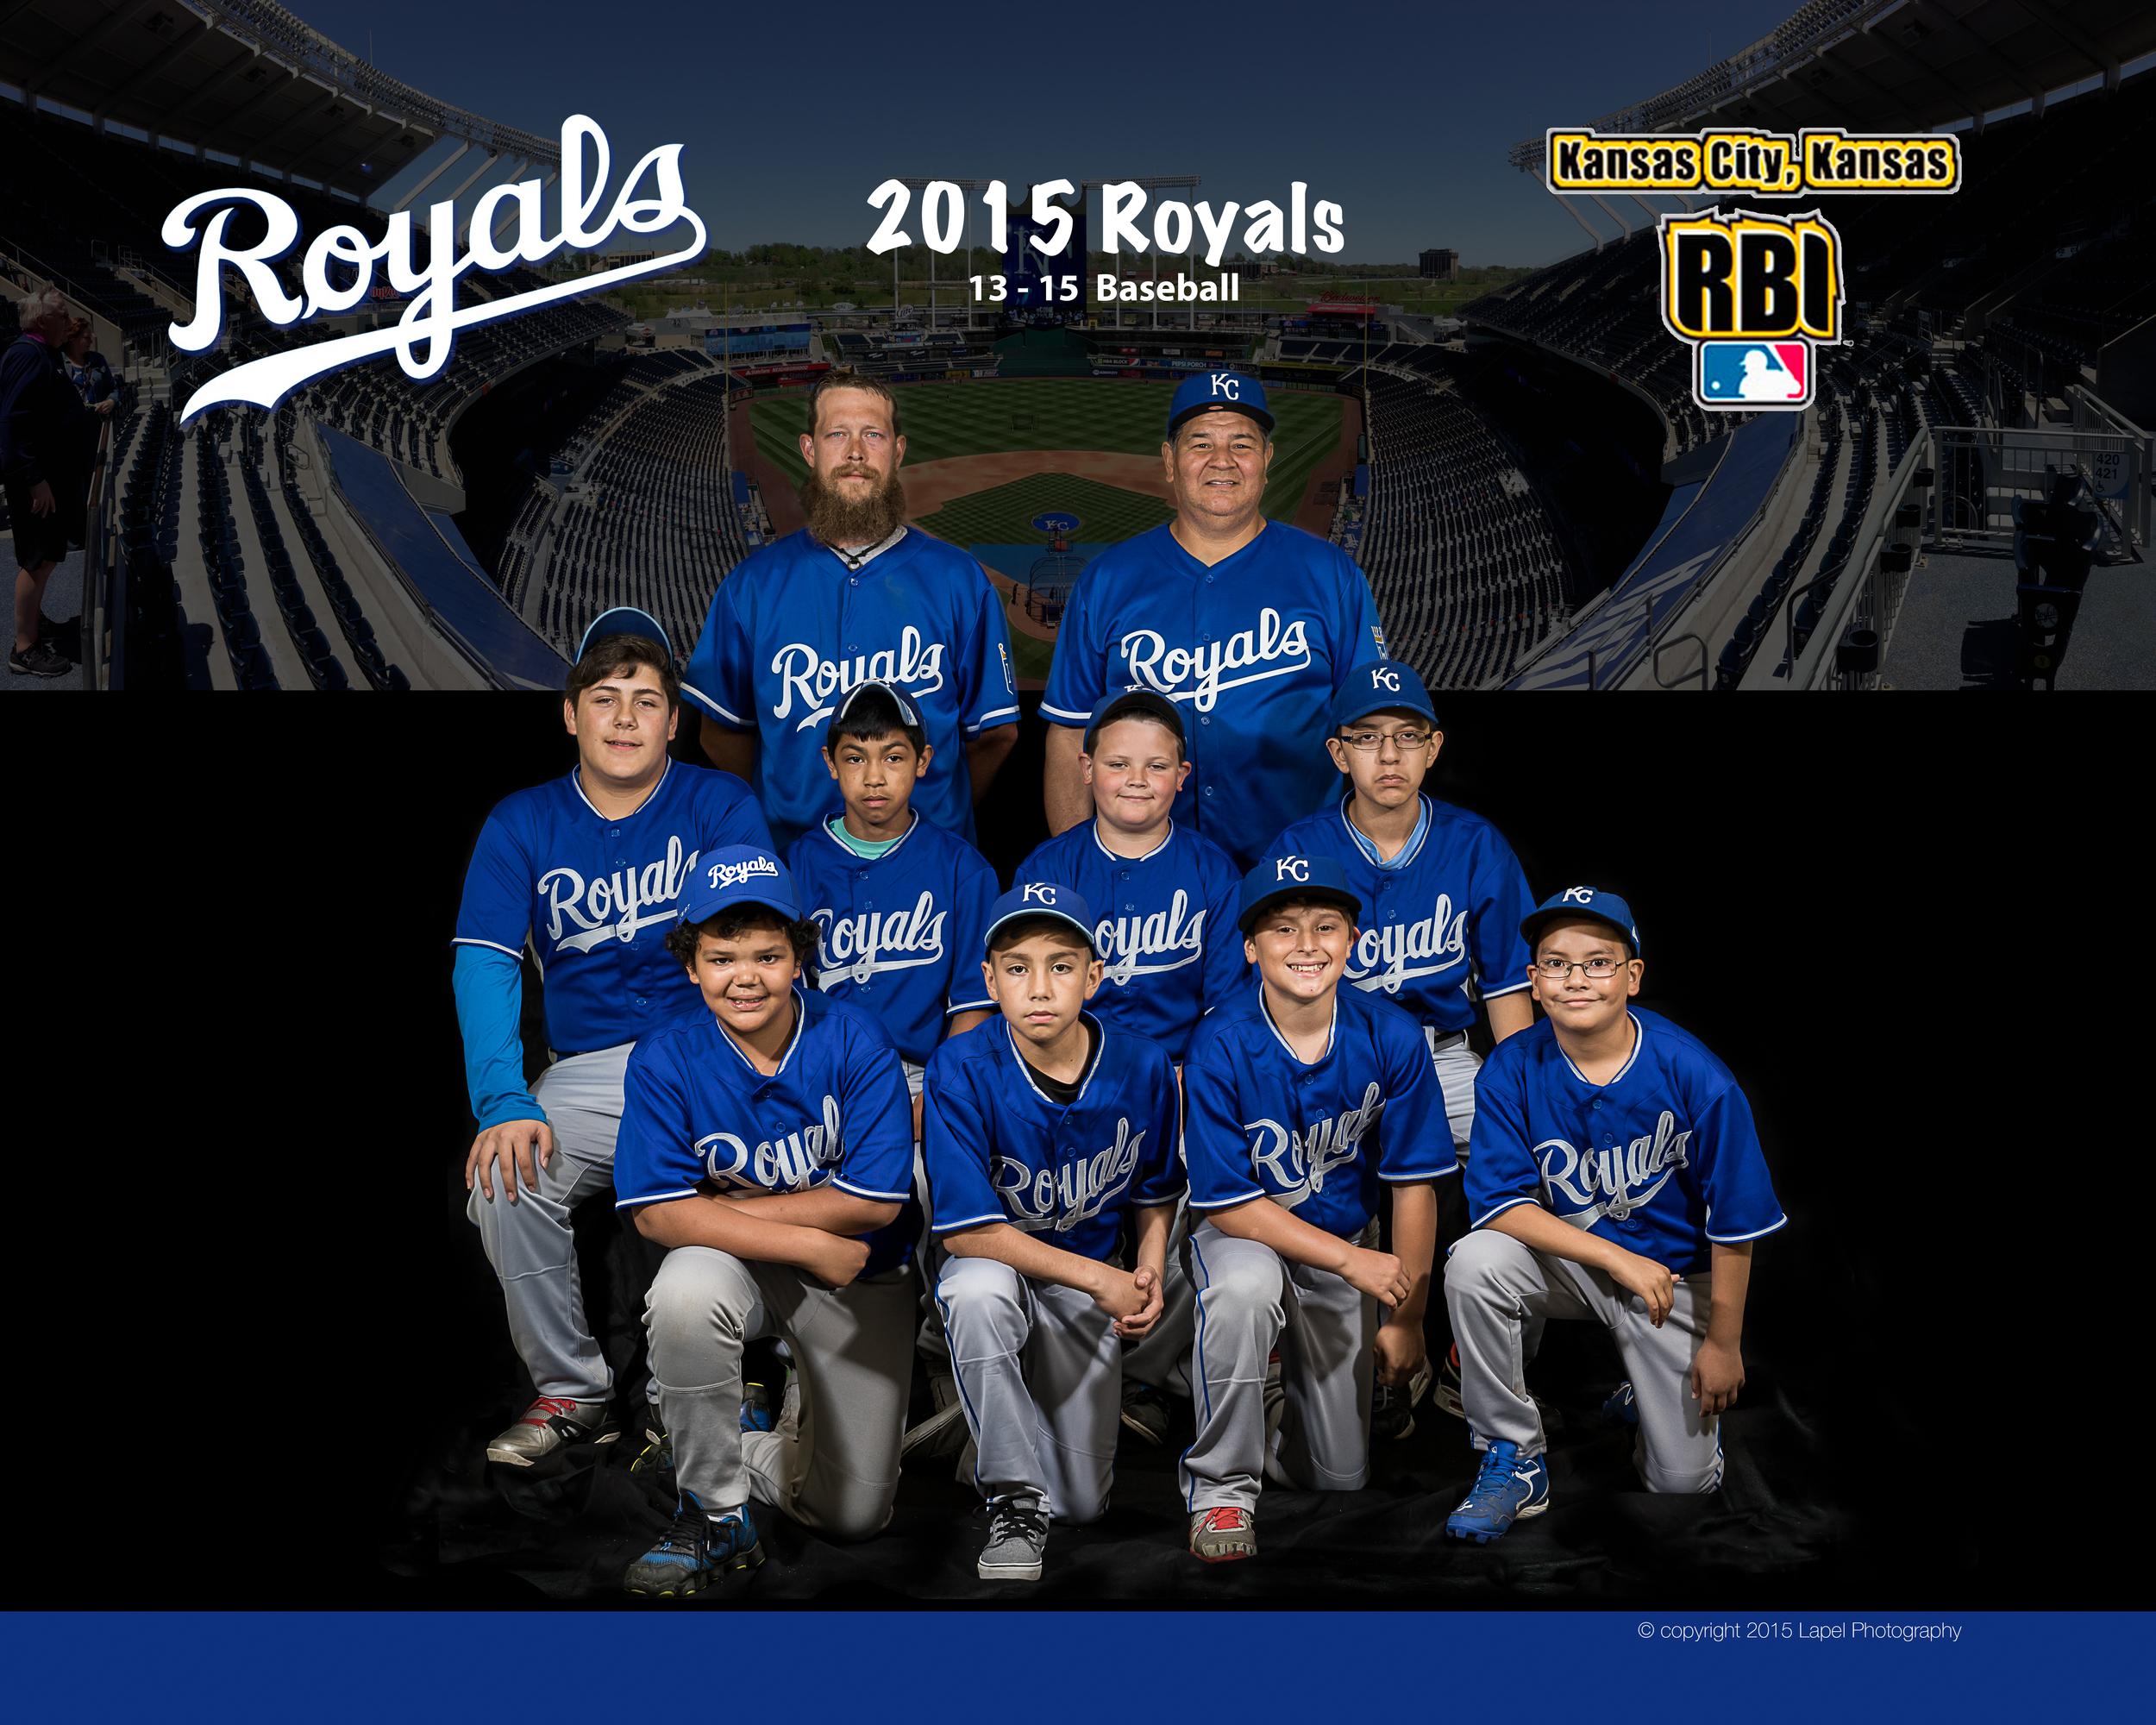 royals1.jpg